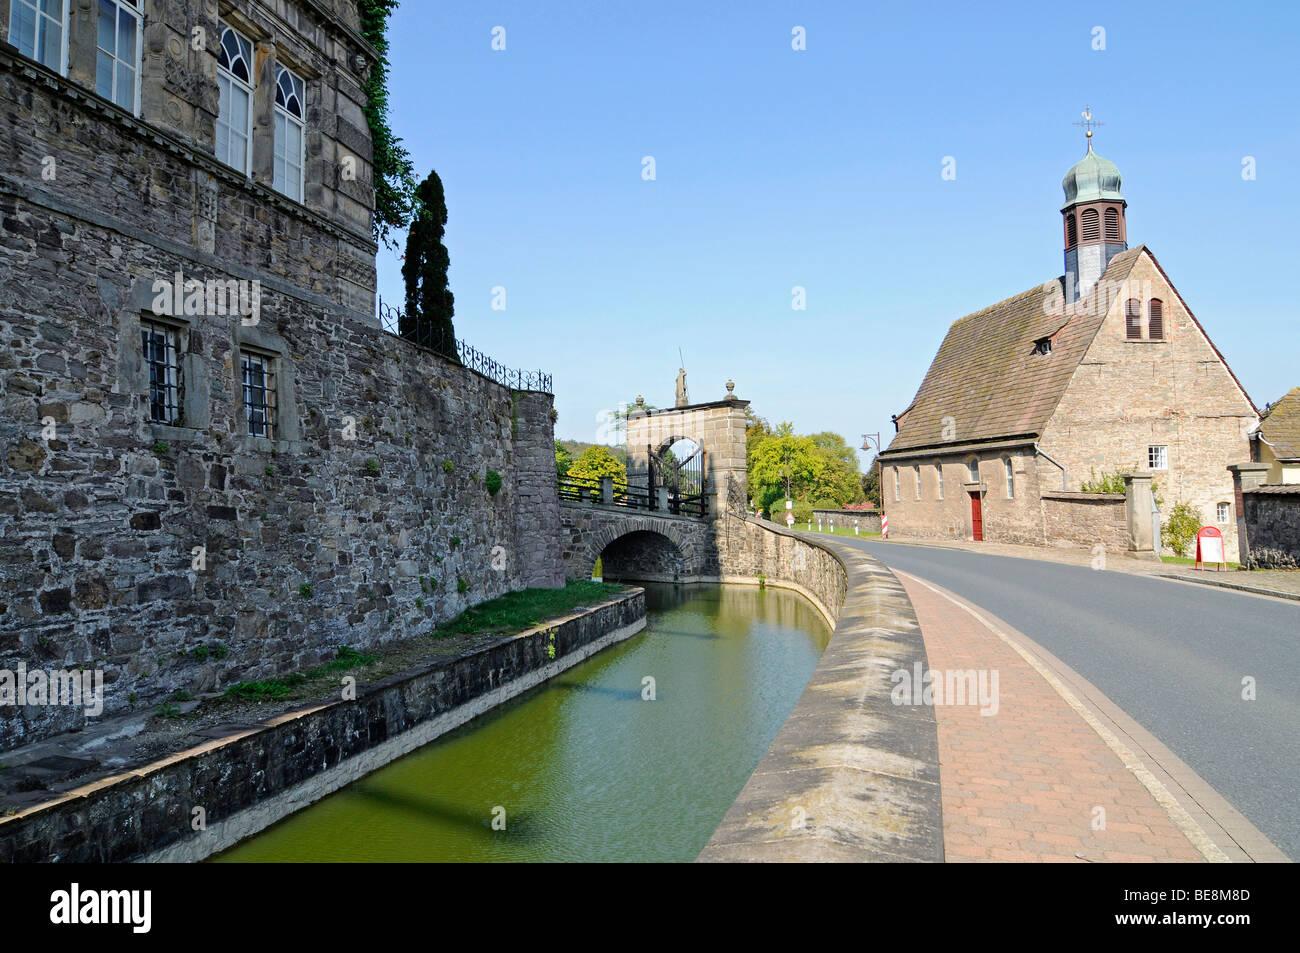 Chapel, Haemelschenburg Castle, Weser Renaissance, Bad Pyrmont, Hameln, Emmerthal, Lower Saxony, Germany, Europe Stock Photo